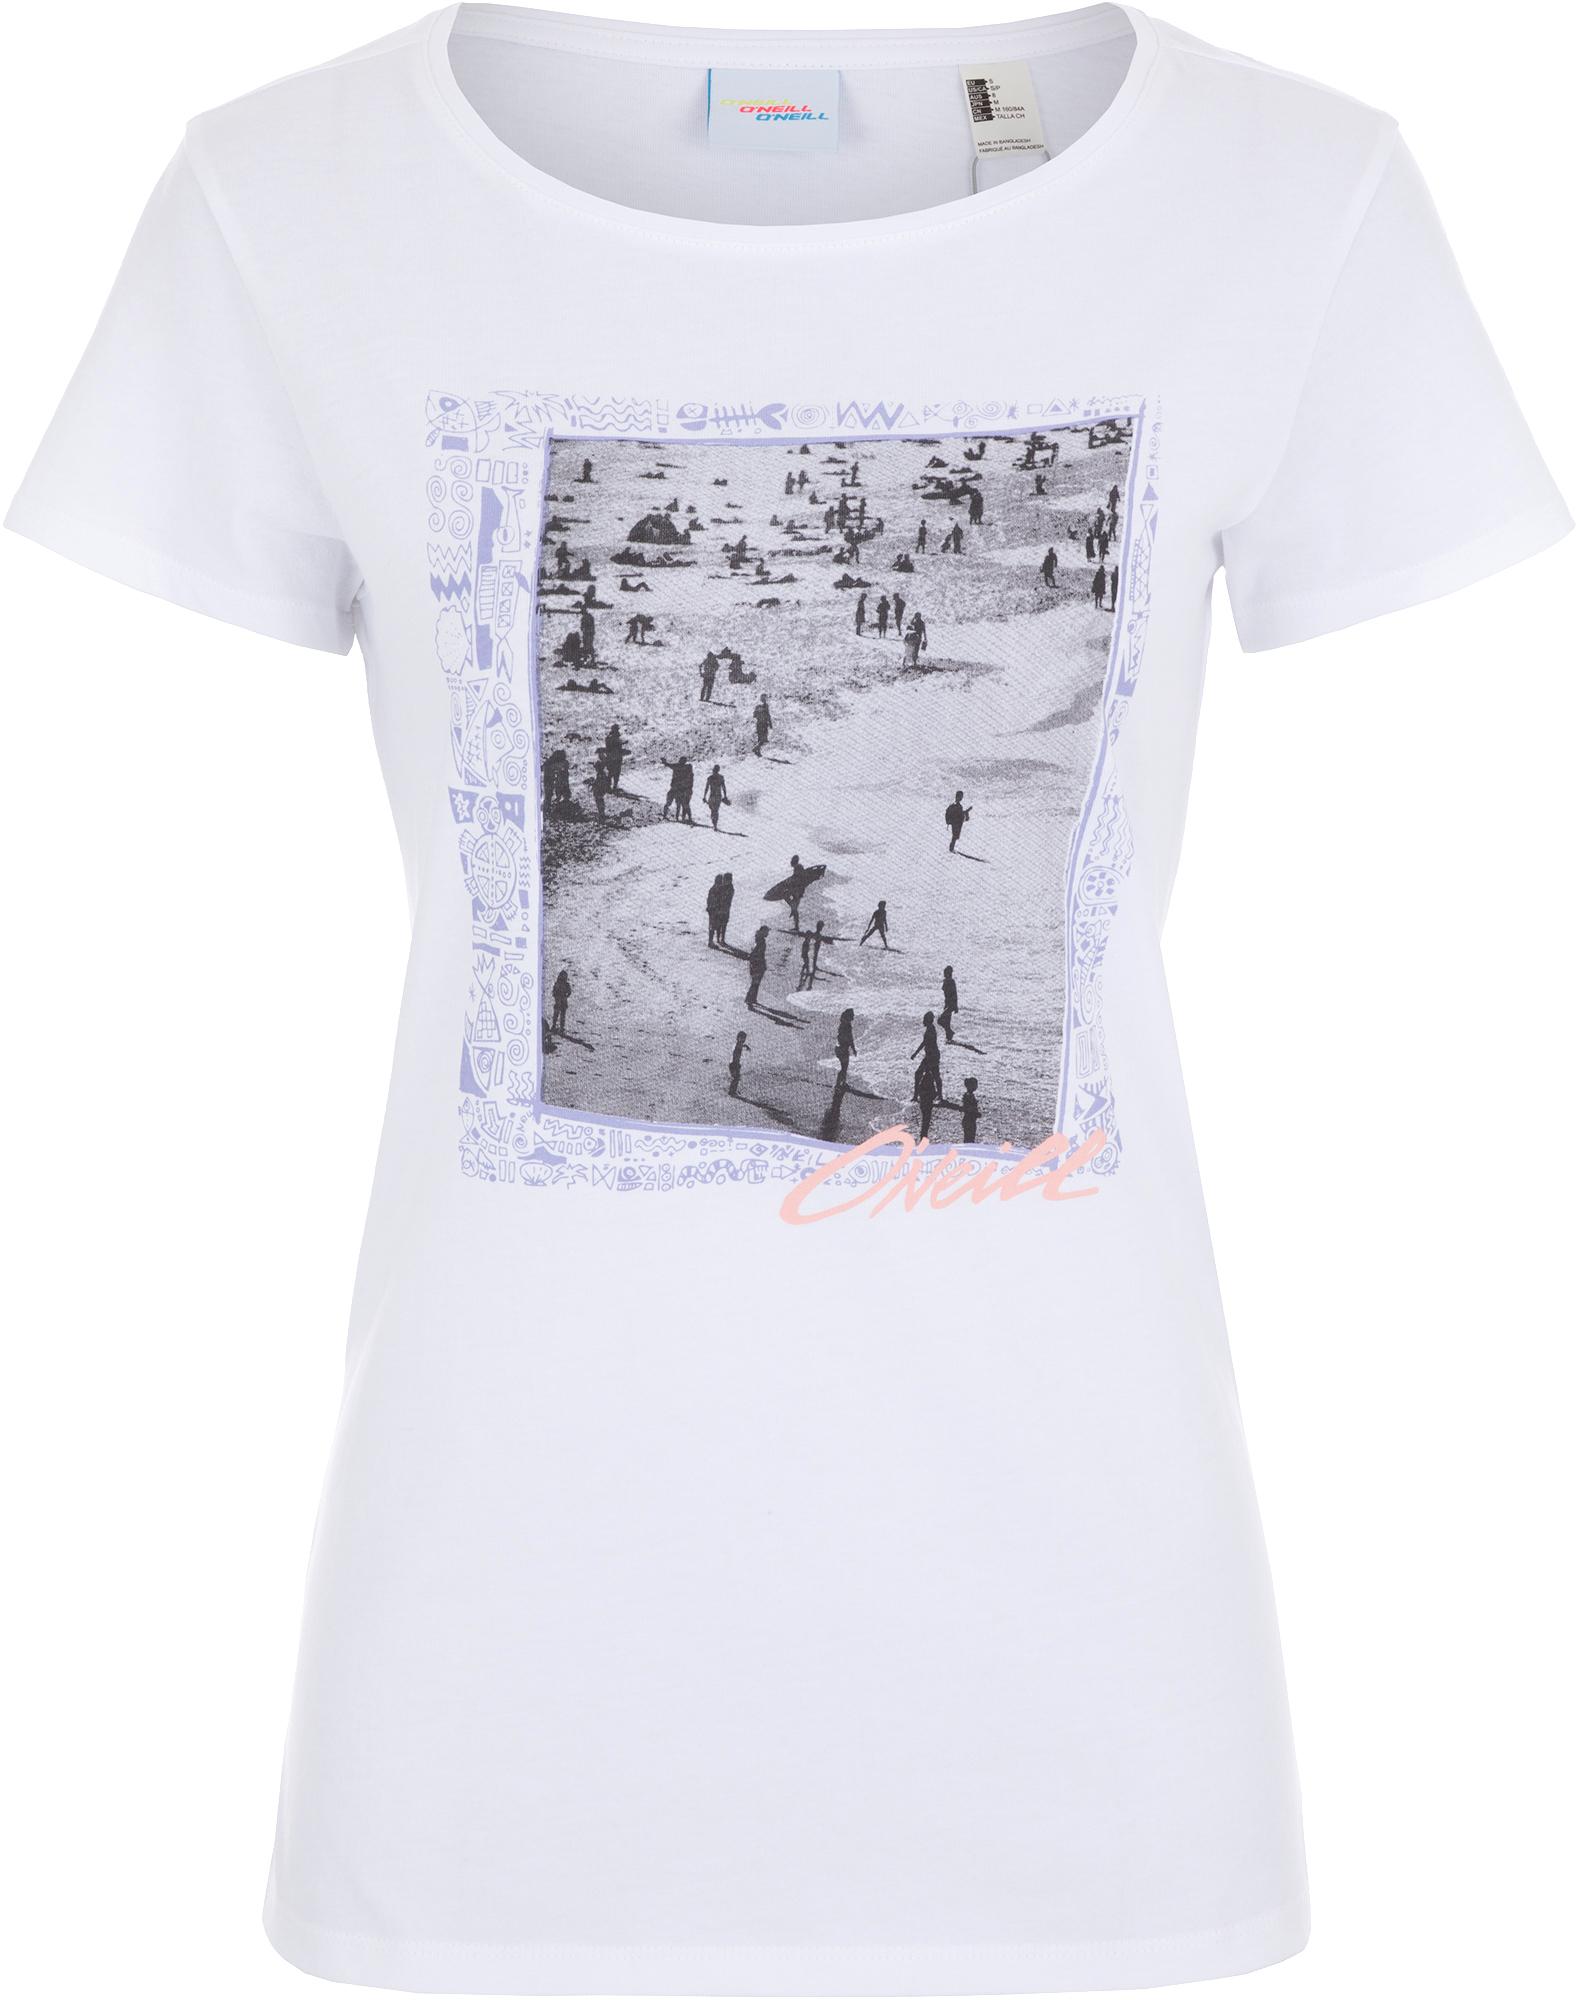 купить O'Neill Футболка женская O'Neill Lw Tora In New York, размер 44-46 по цене 499 рублей